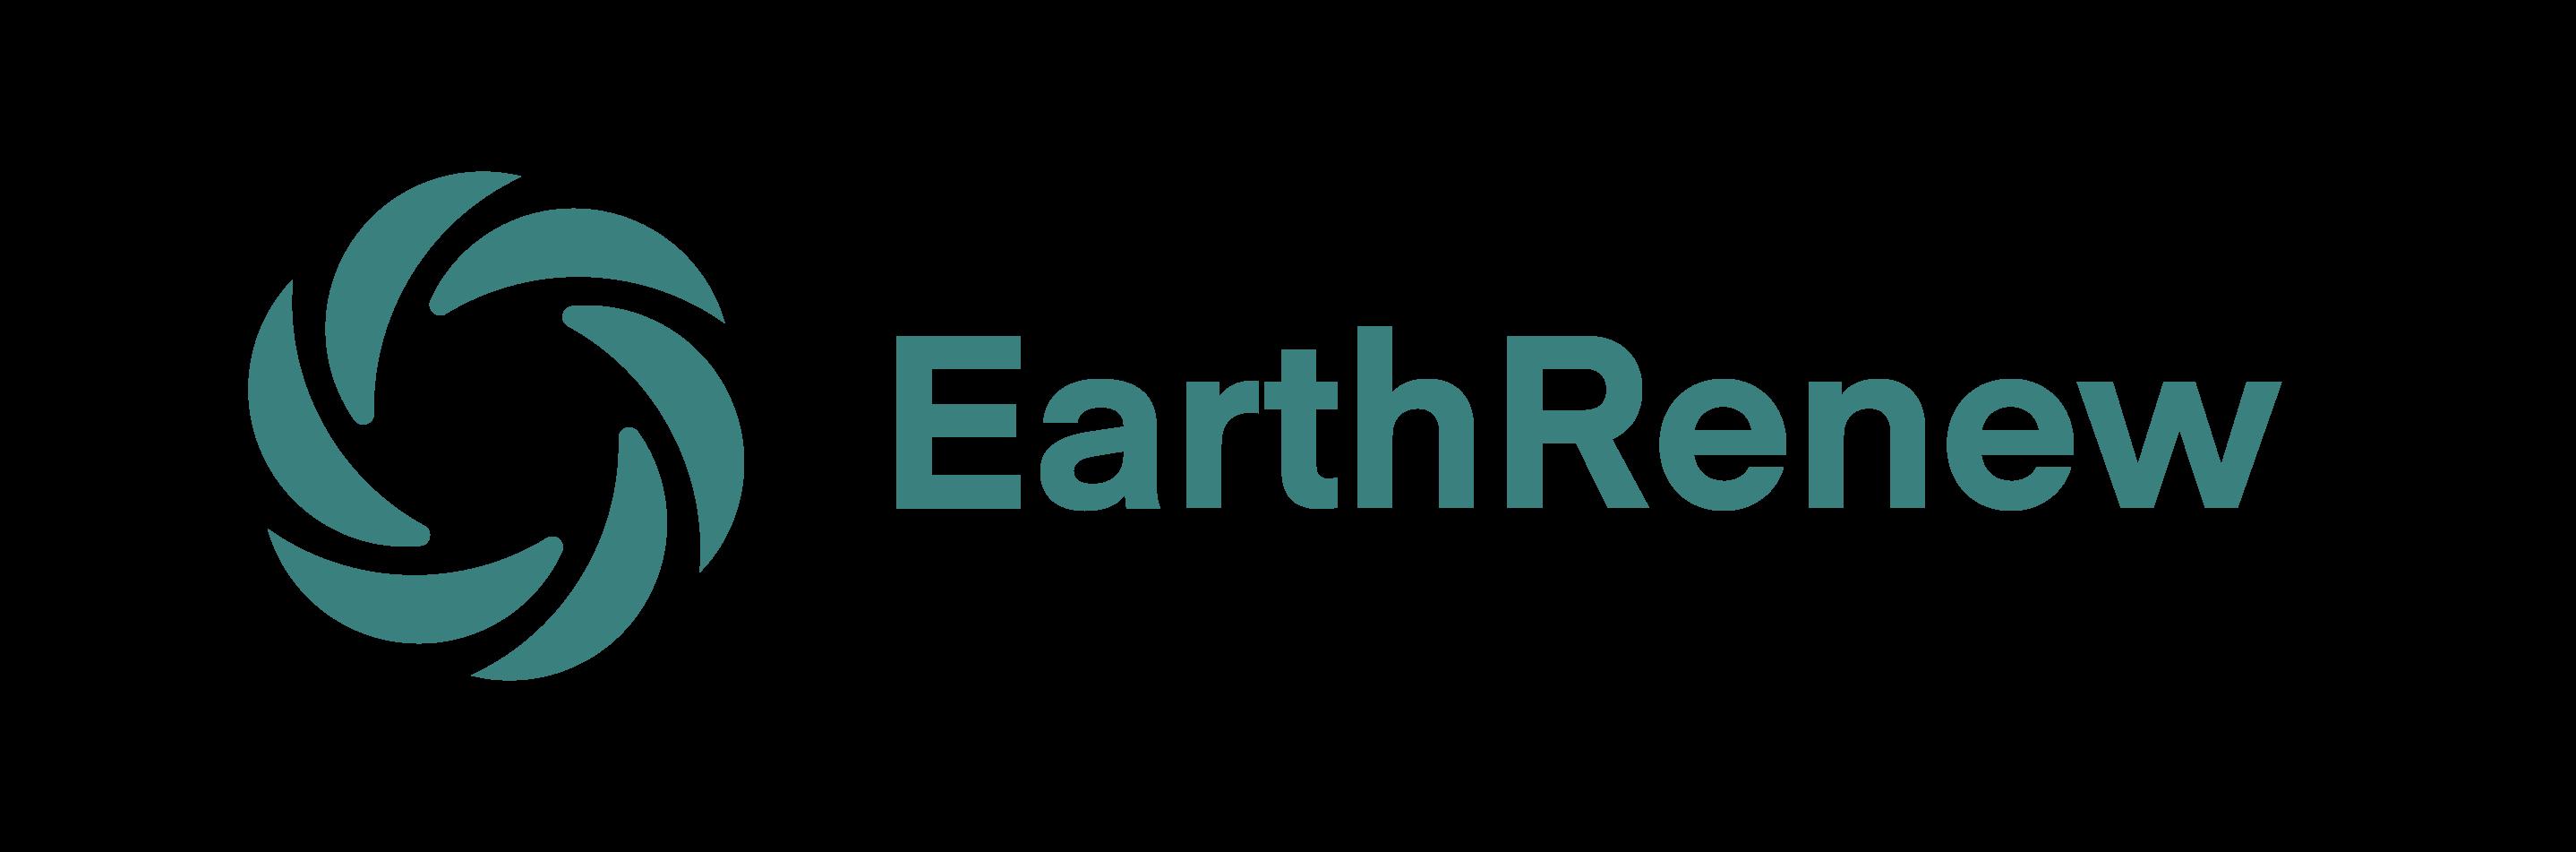 EarthRenew Enters Into Marketing Agreement